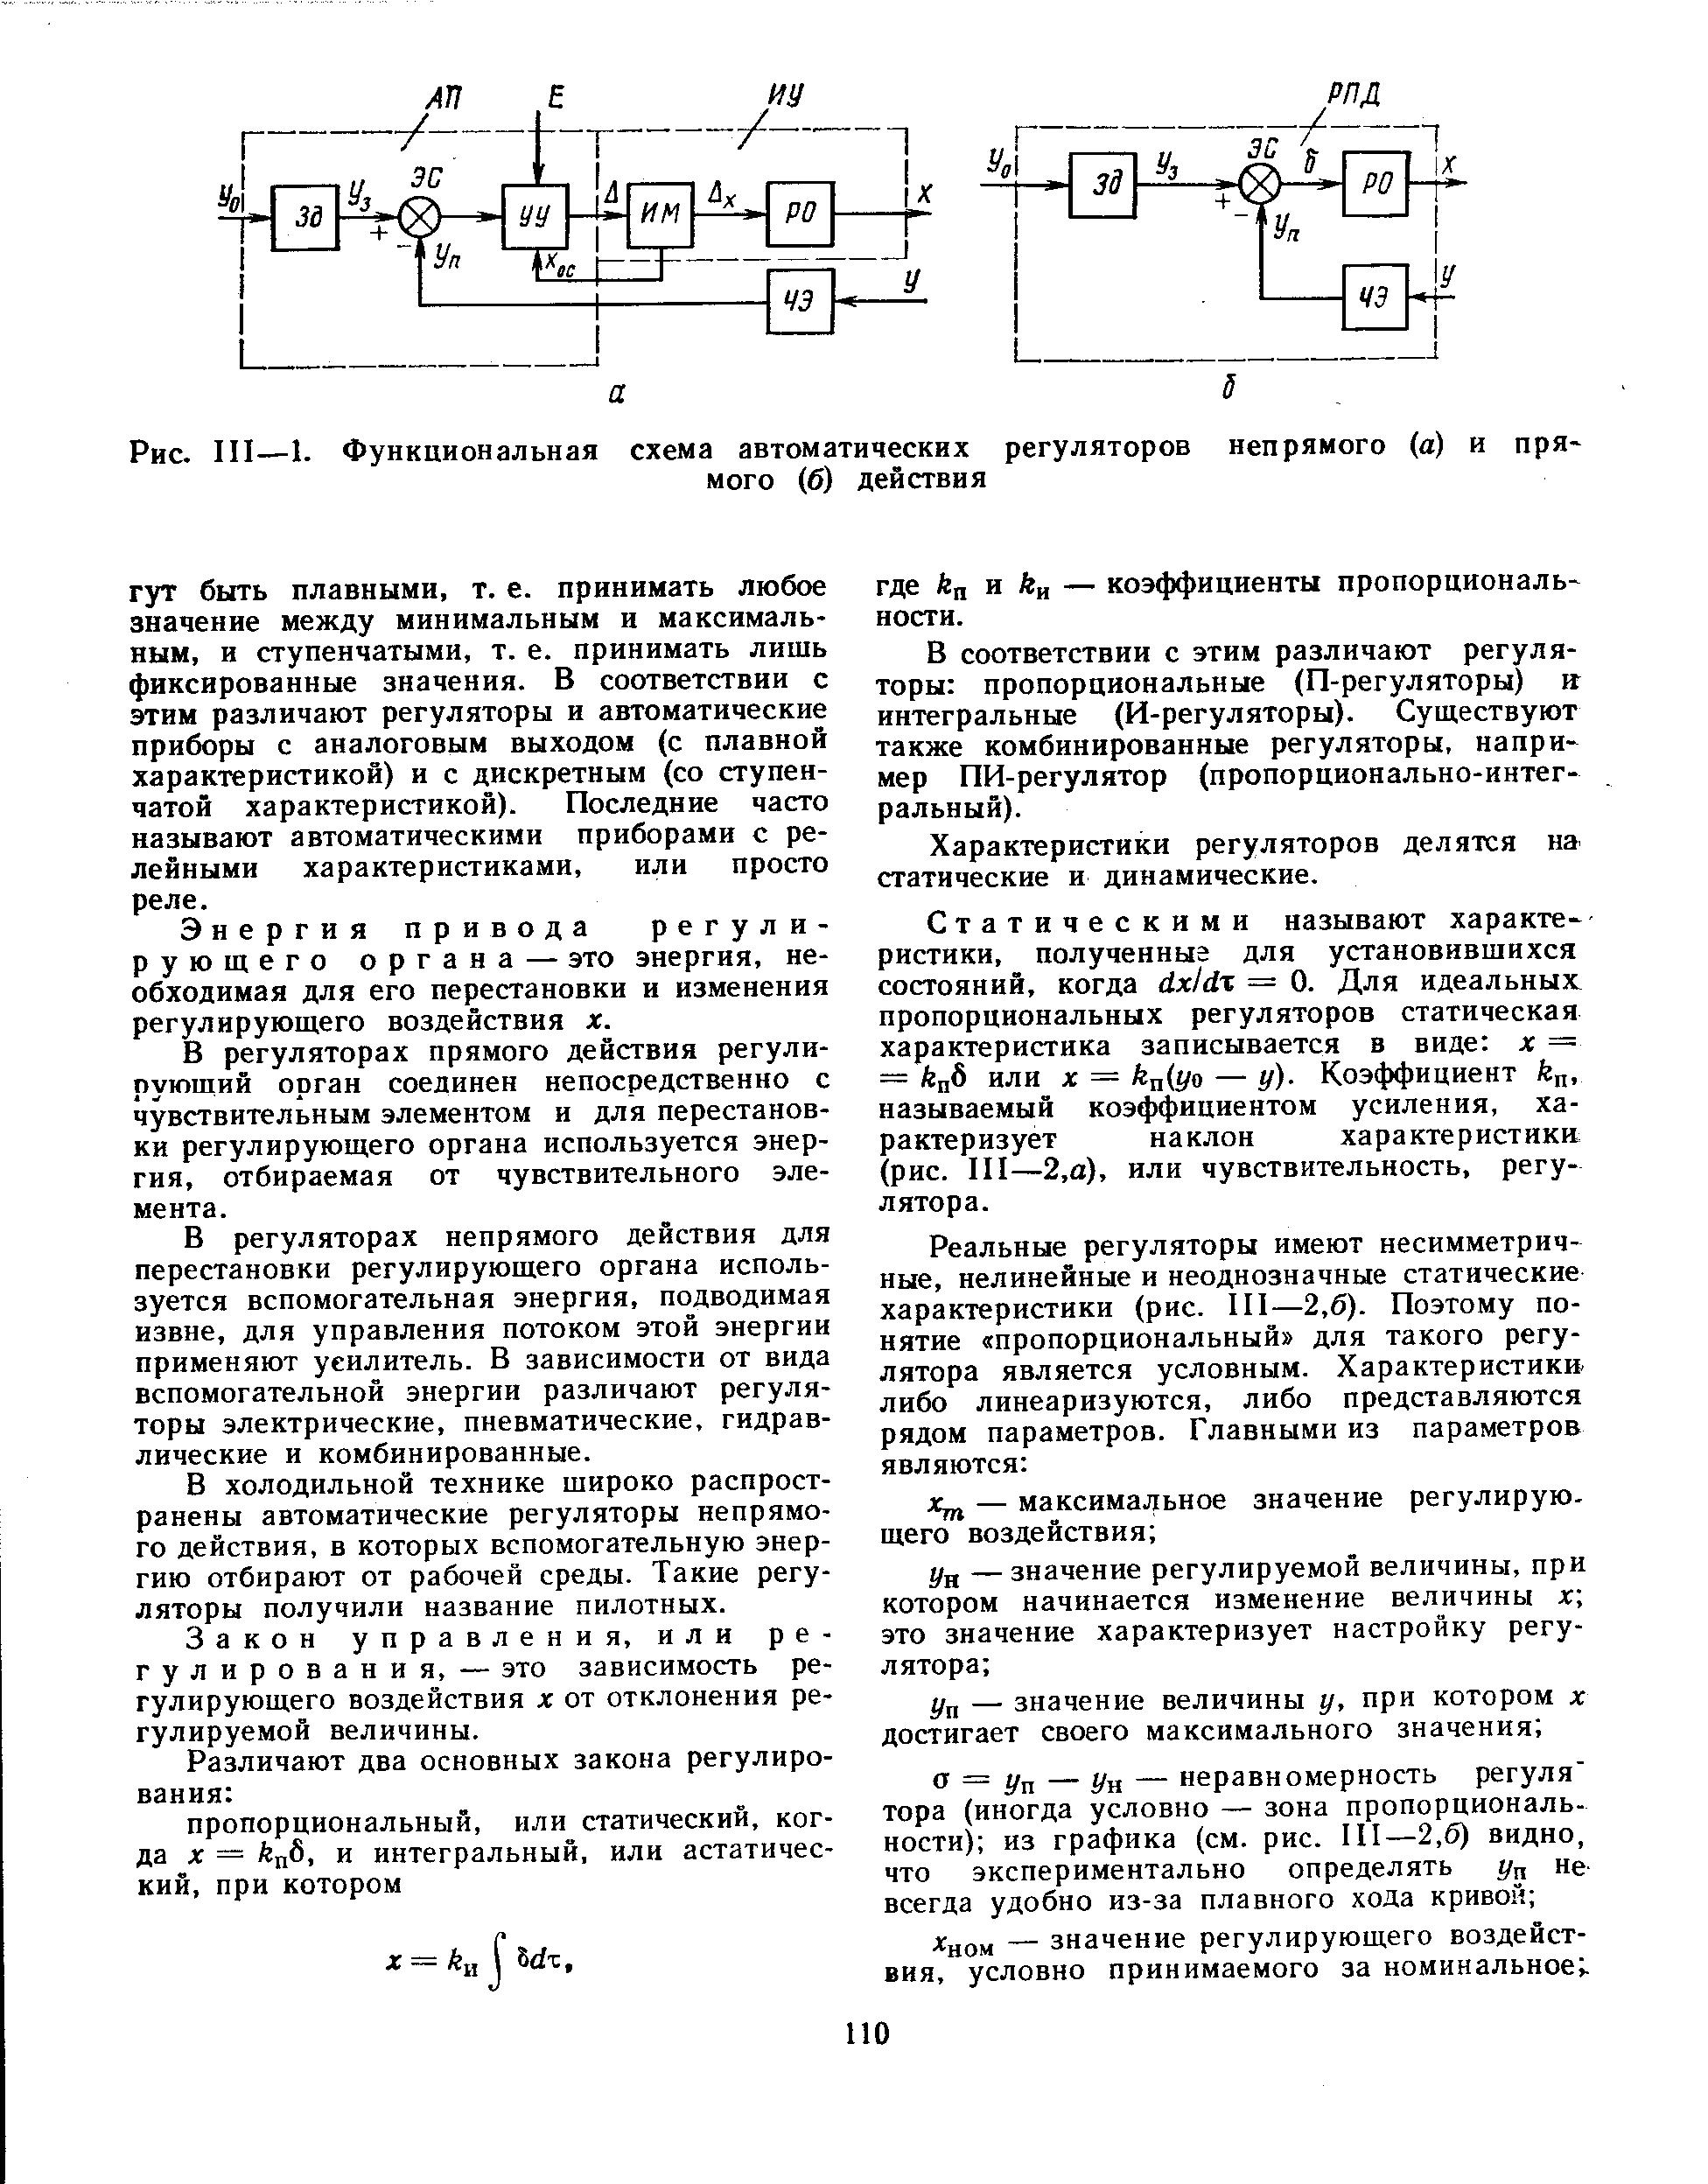 Автоматические регуляторы - файл 1.doc